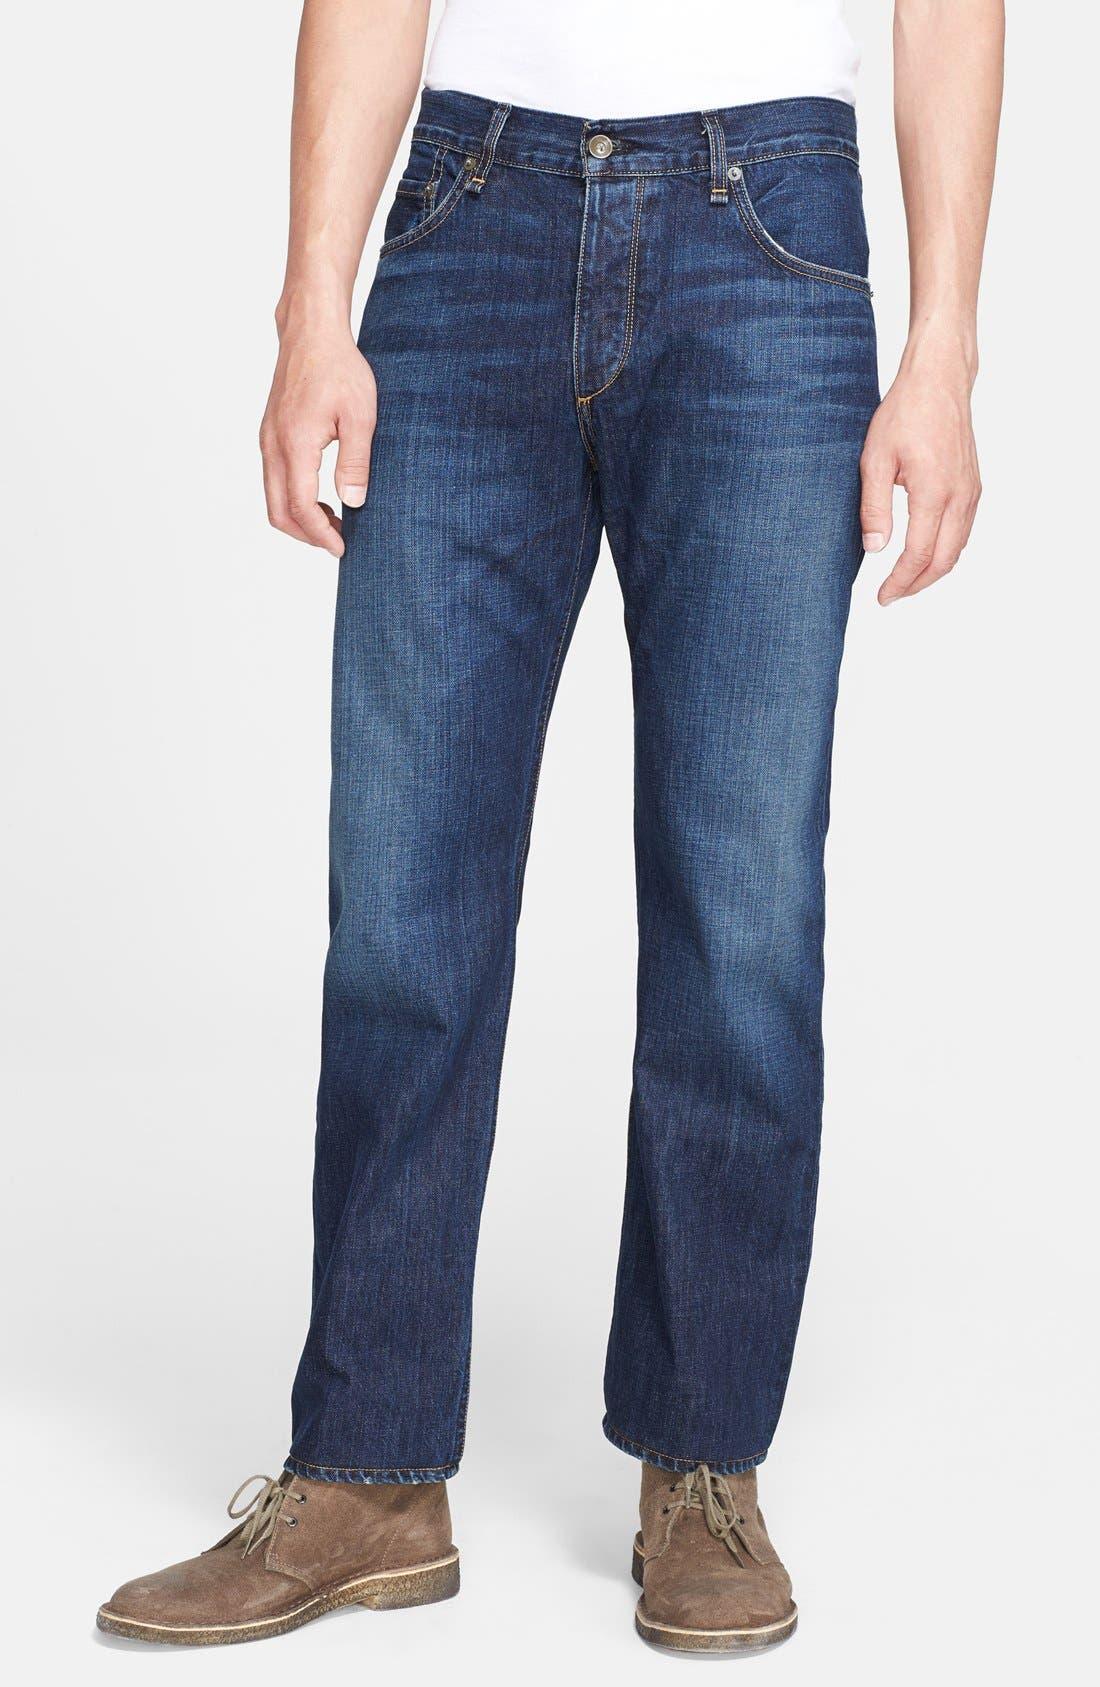 Alternate Image 1 Selected - rag & bone 'RB15X' Slim Straight Leg Jeans (Berkely Blue)